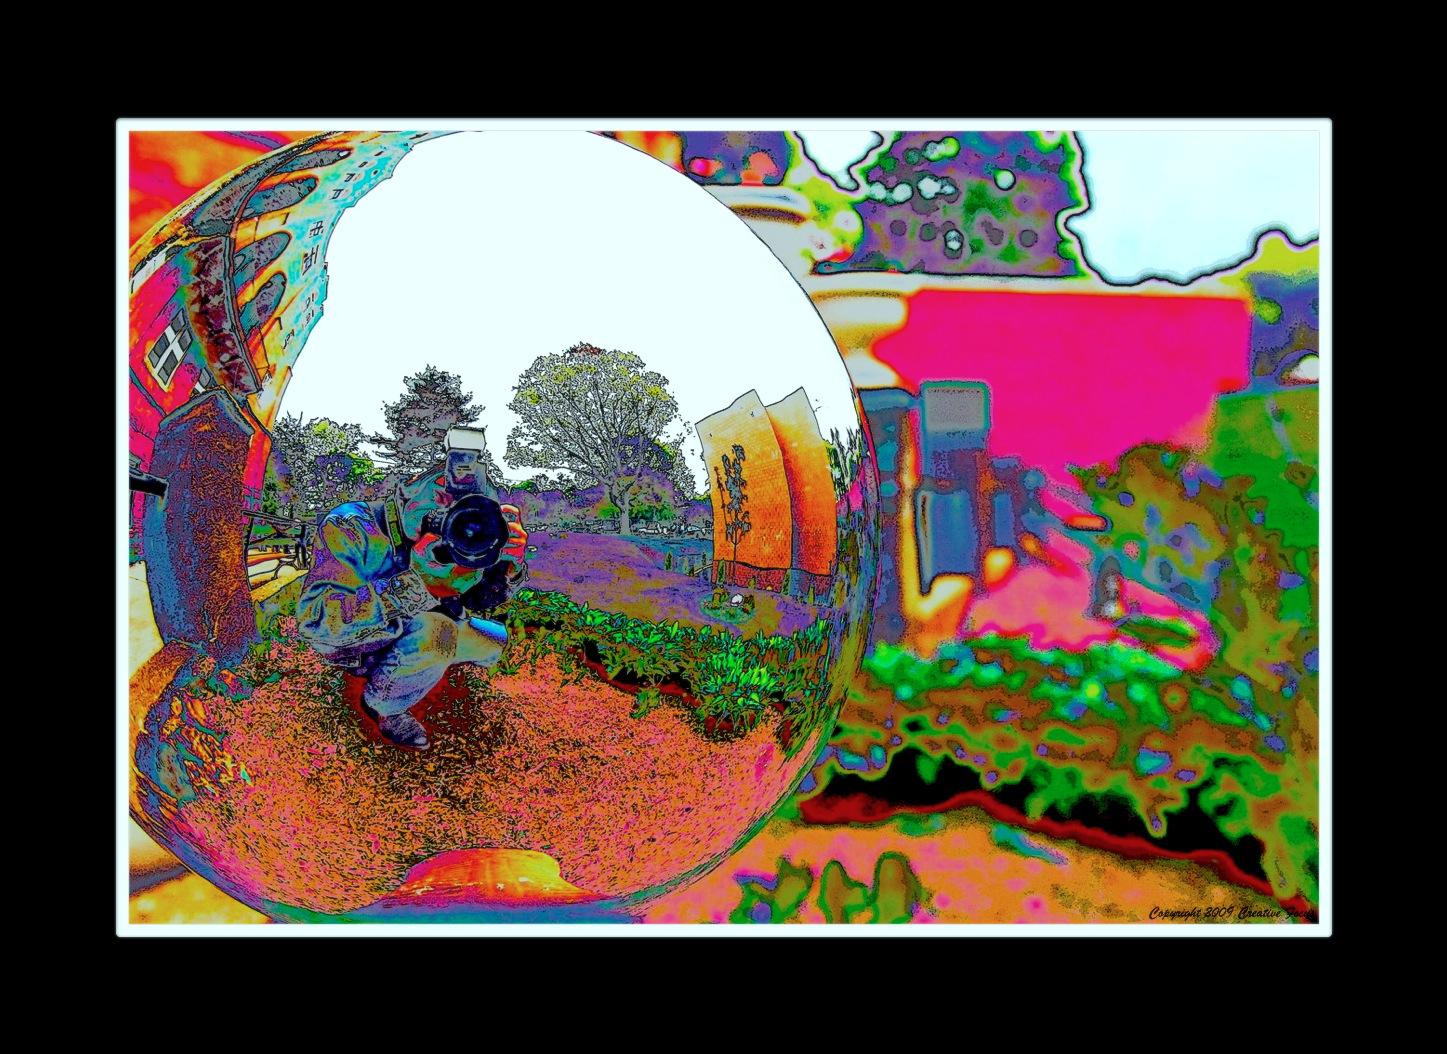 A Garden Of Love 4 U by Trippy4U